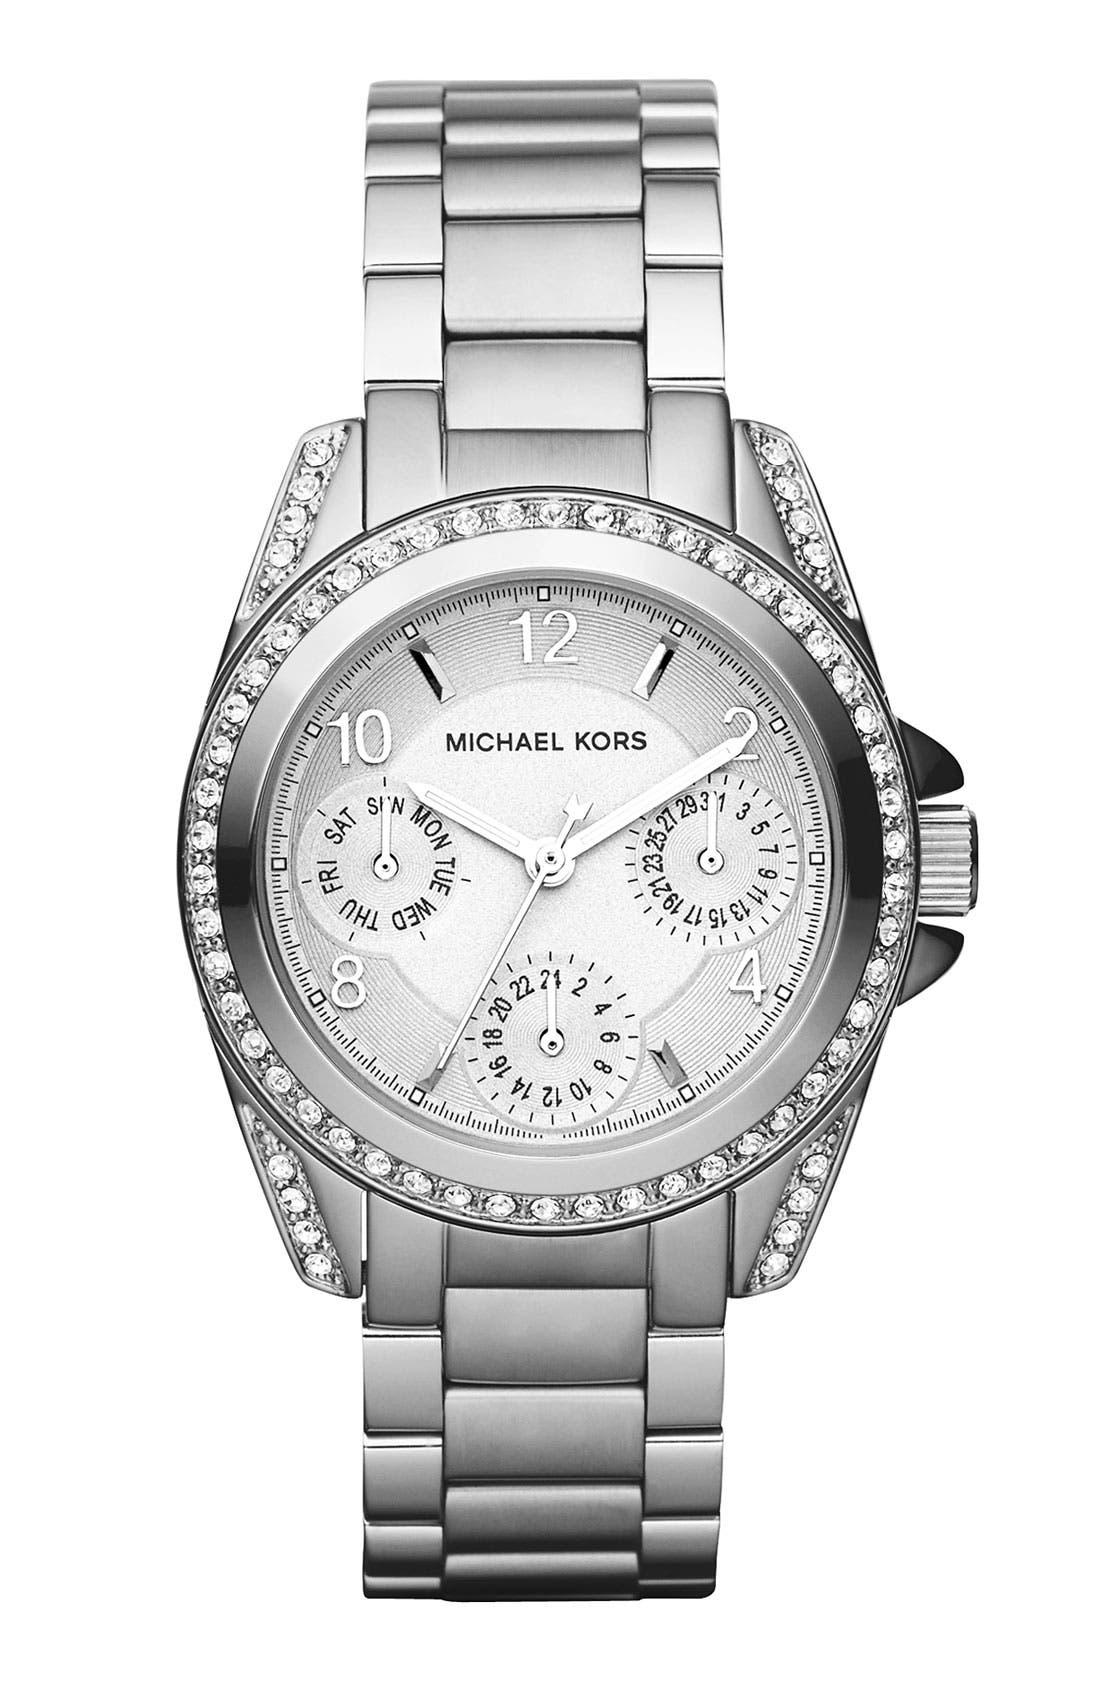 Main Image - Michael Kors 'Blair - Mini' Multifunction Watch, 33mm